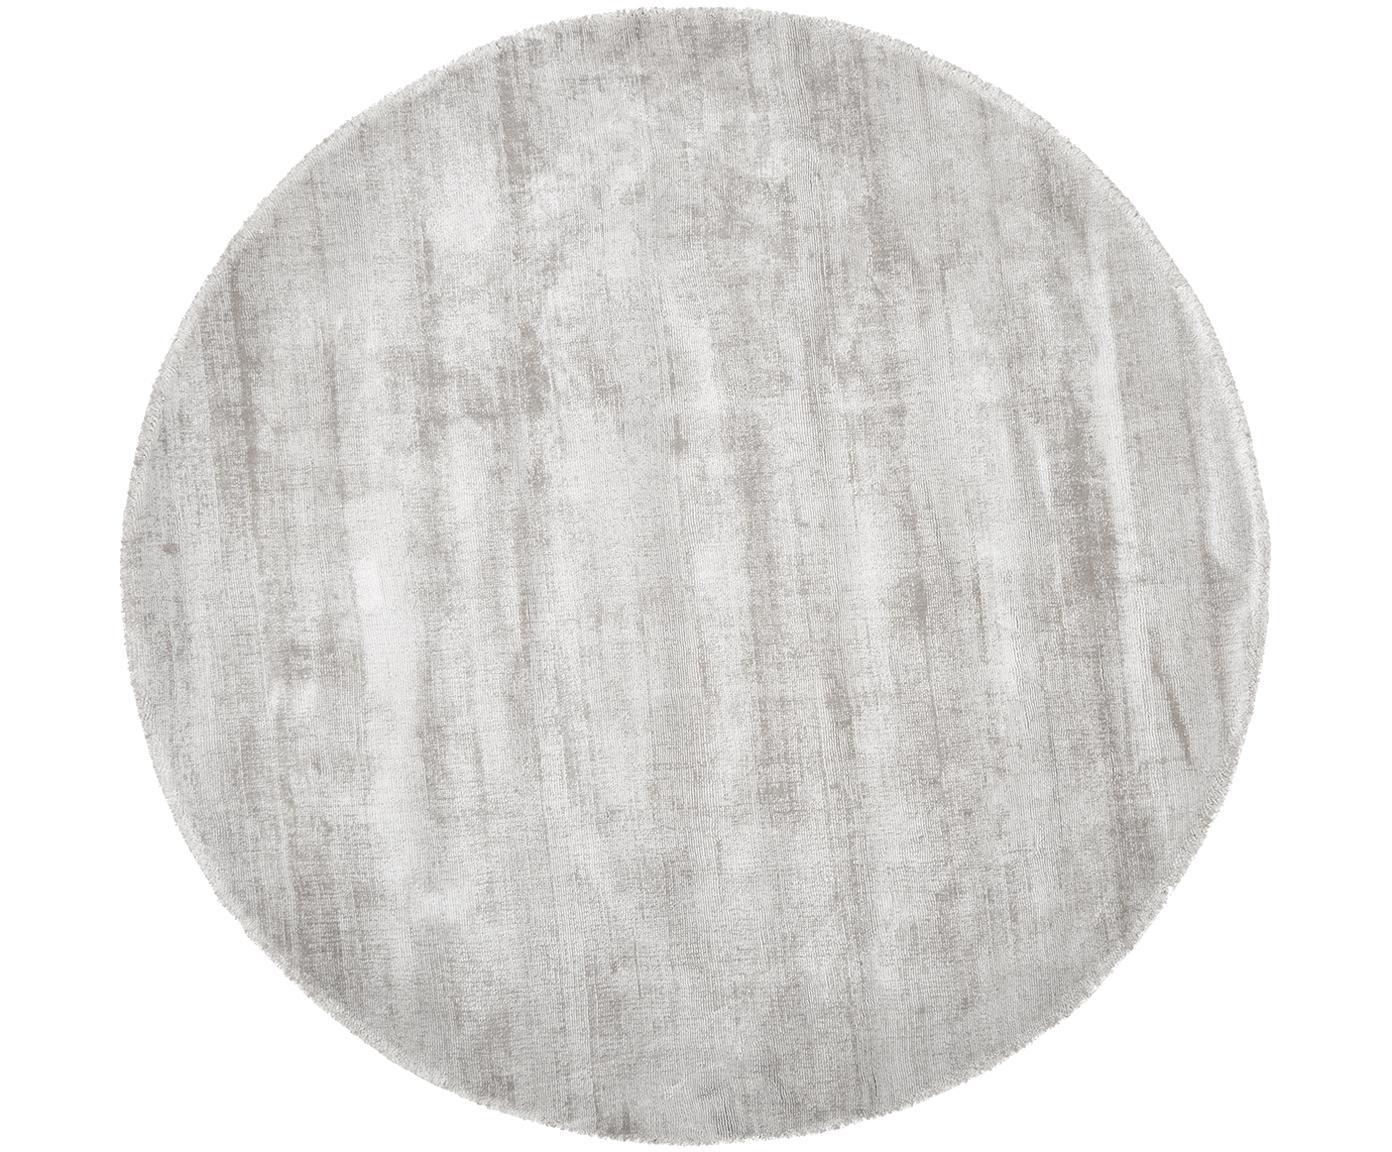 Alfombra redonda artesanal de viscosa Jane, Parte superior: 100%viscosa, Reverso: 100%algodón, Gris claro, beige, Ø 120 cm (Tamaño S)